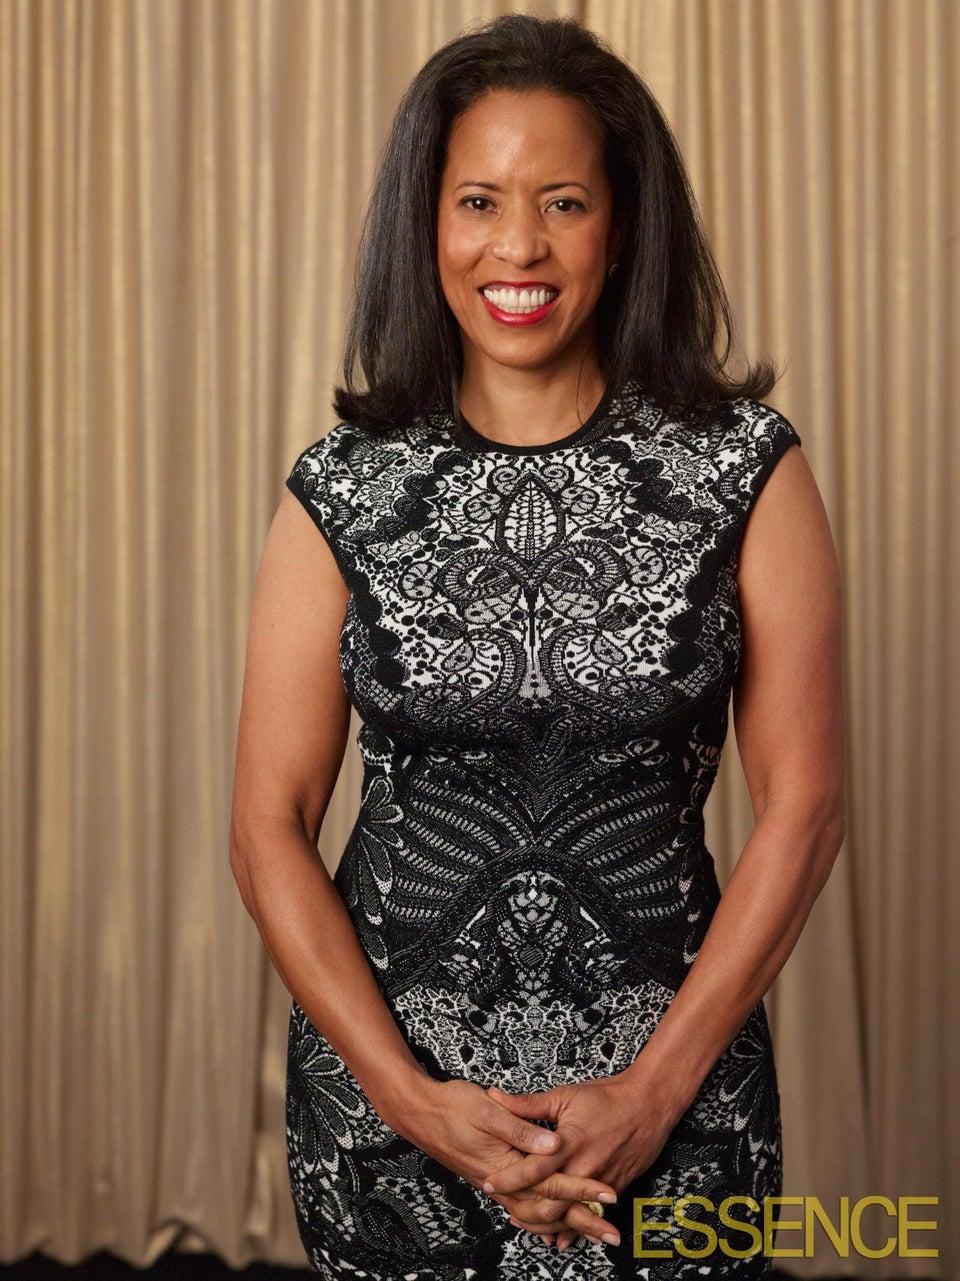 Interview: ESSENCE Mag President Michelle Ebanks Talks #ESSENCEFest on The Steve Harvey Morning Show